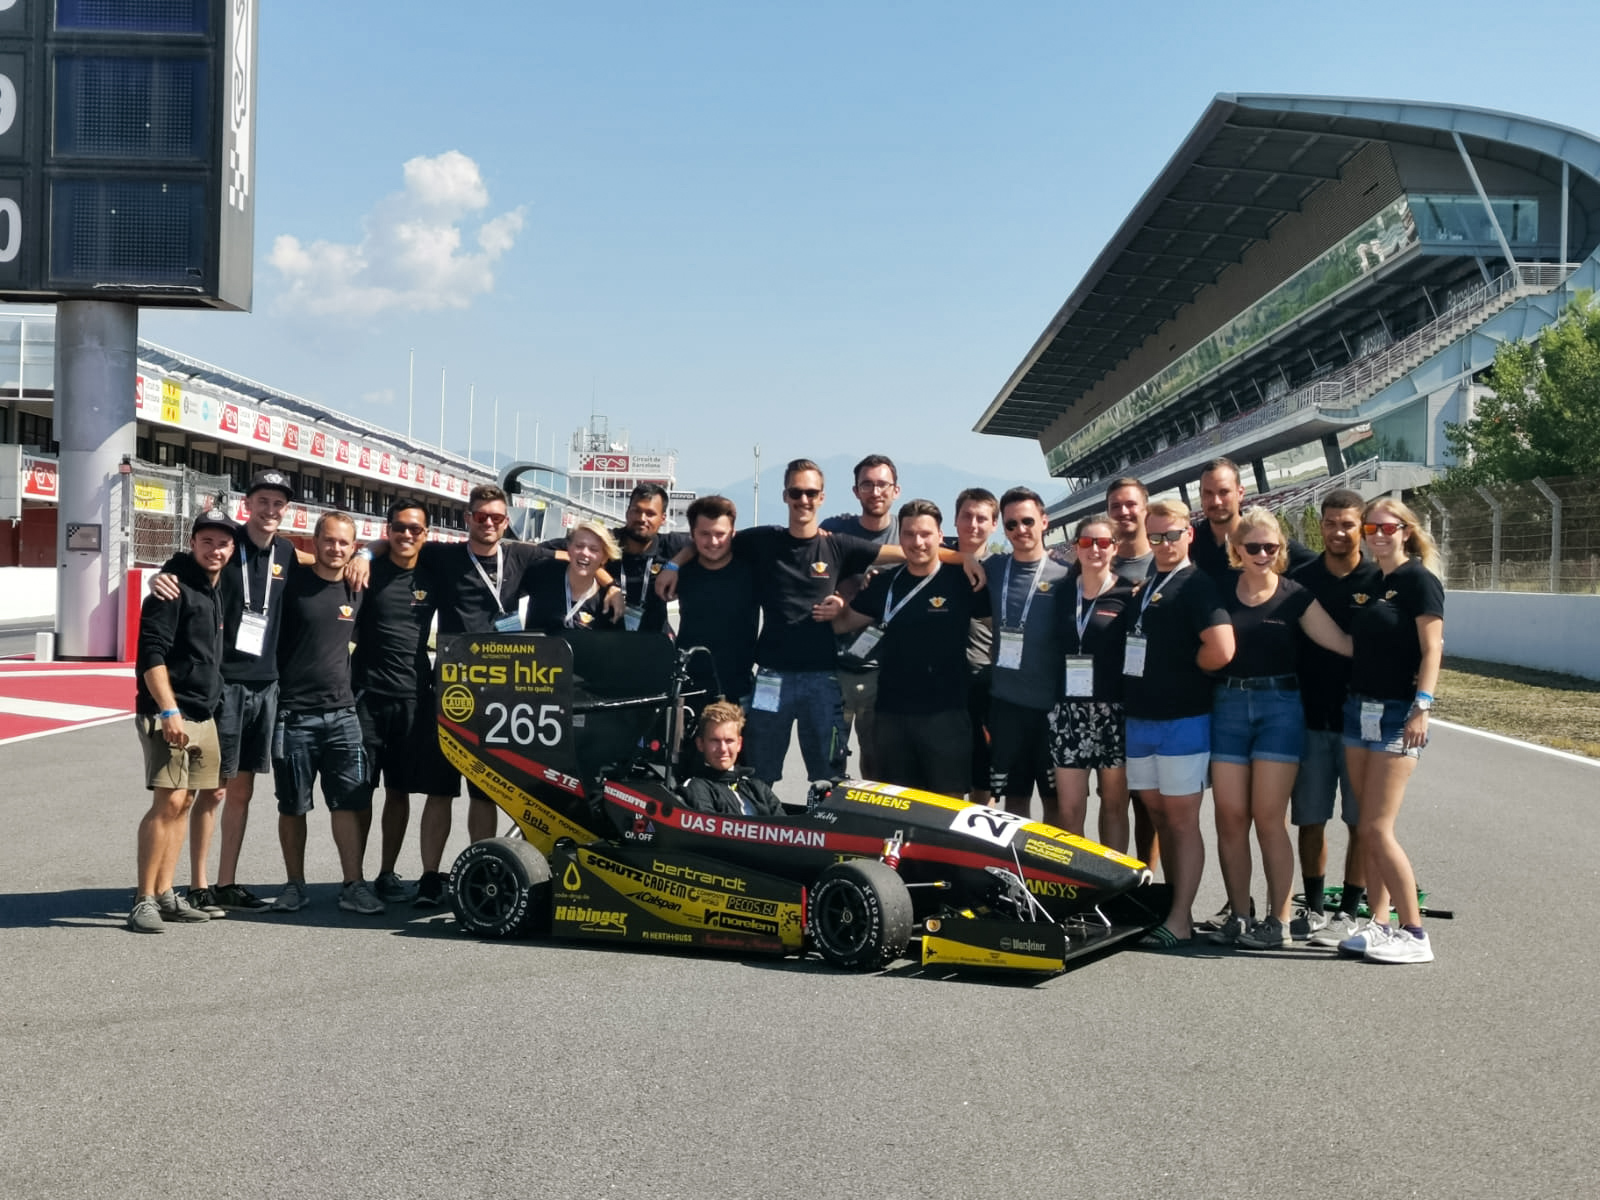 Formula-Student-Gruppenfoto-SPR19-Scuderia-Mensa